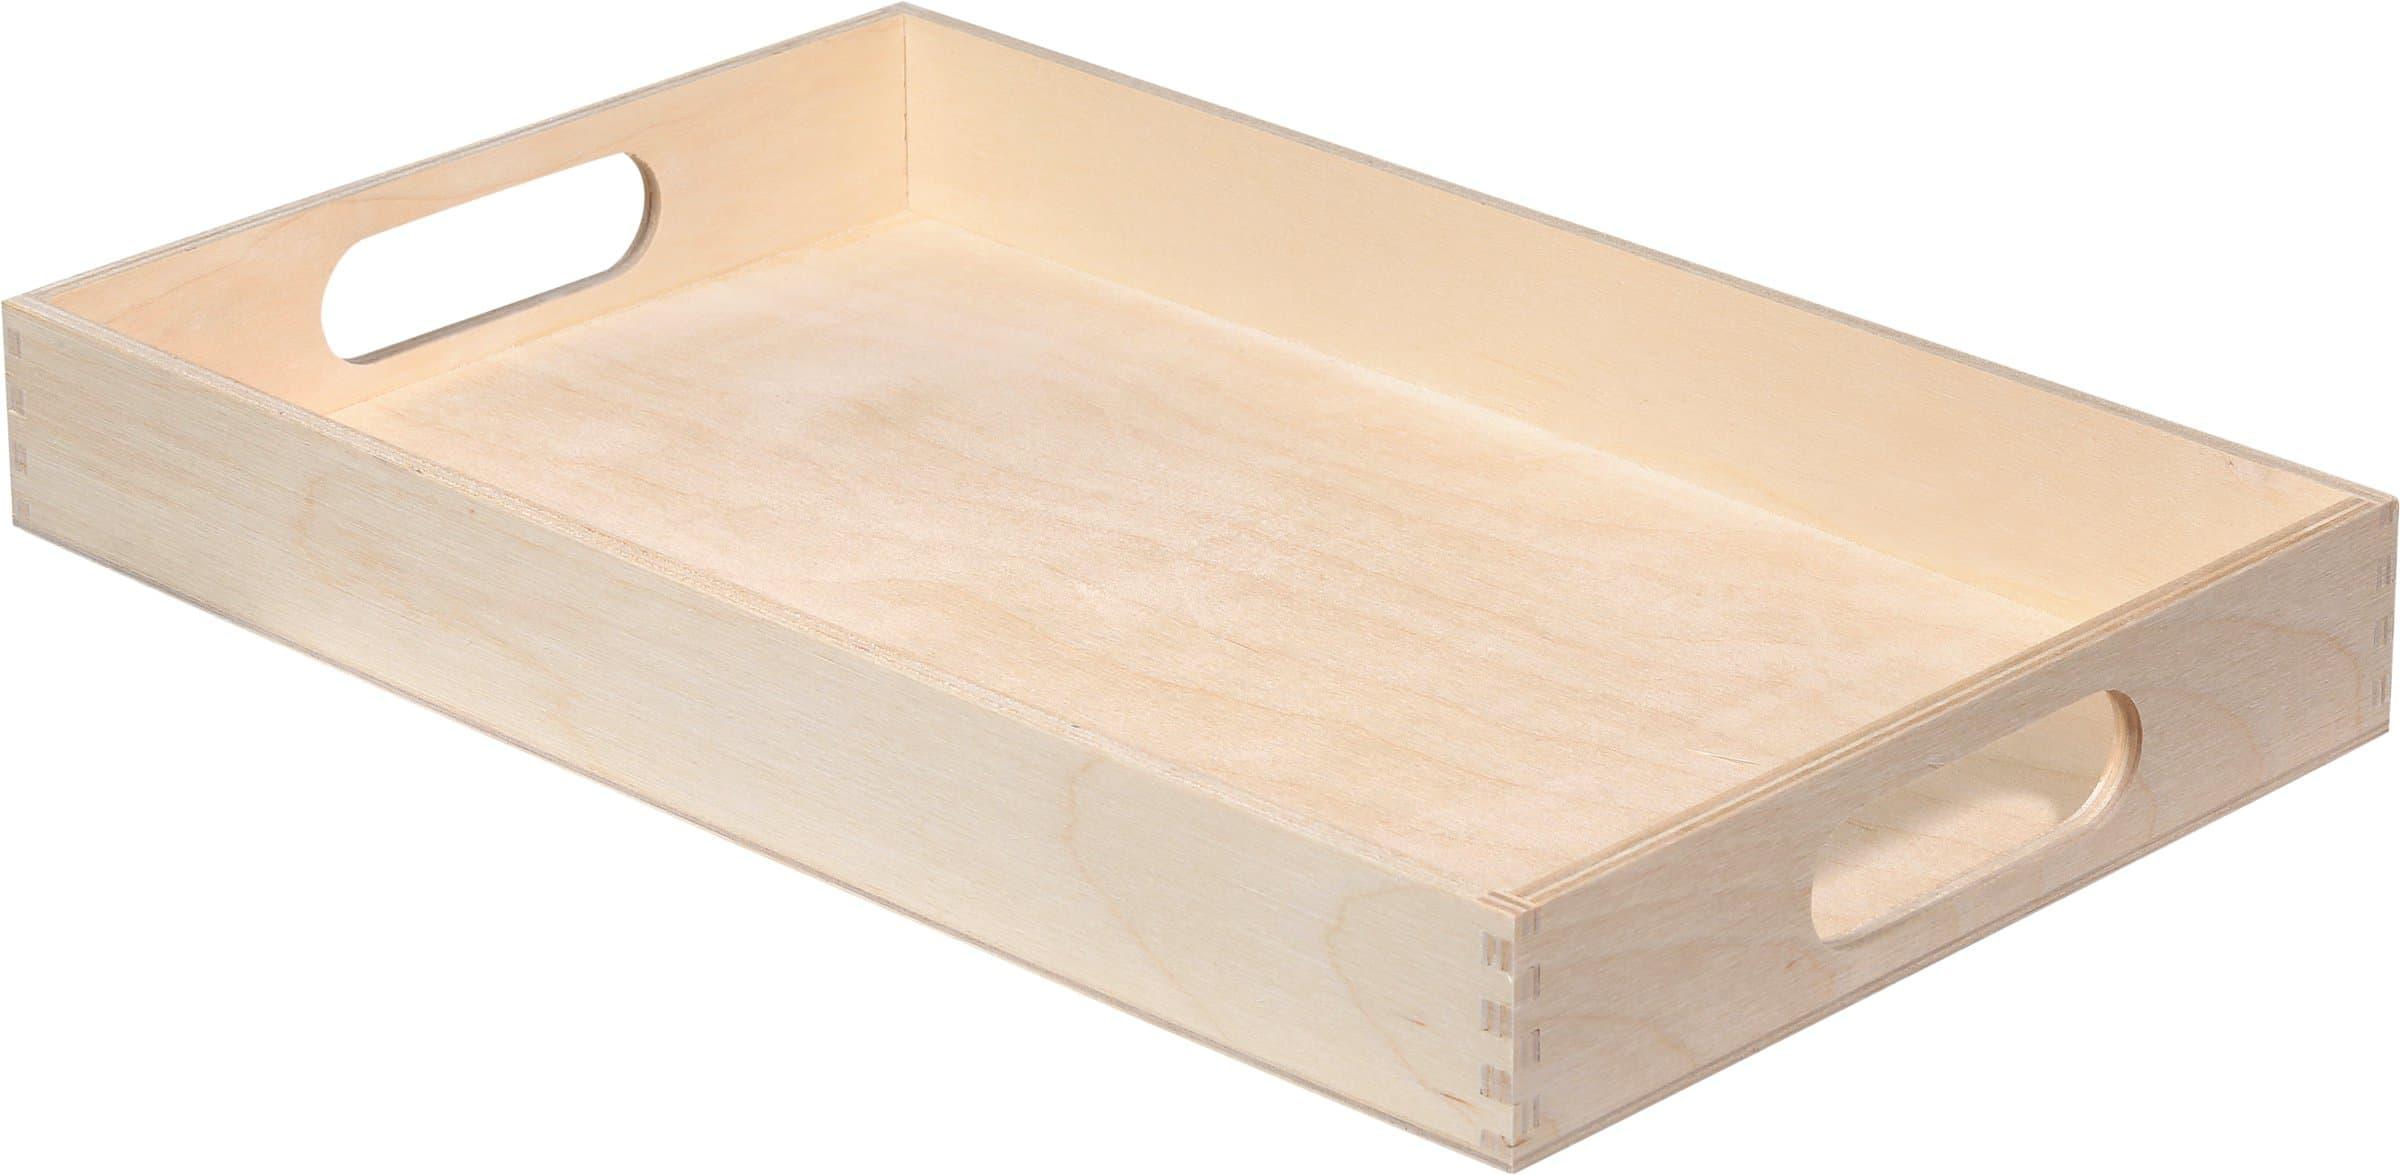 legna creativa tablett holz klein migipedia. Black Bedroom Furniture Sets. Home Design Ideas